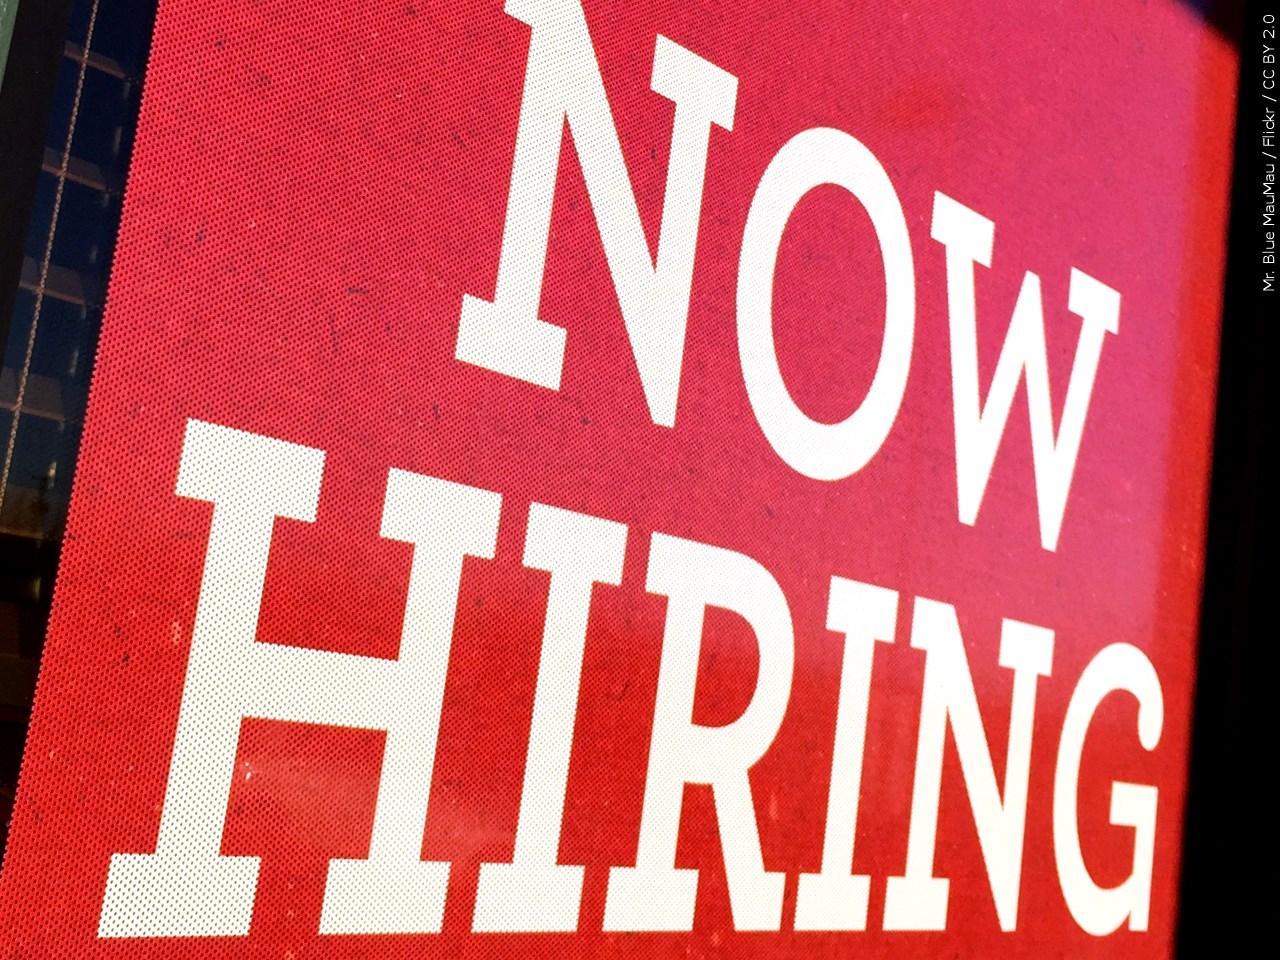 Morongo Casino Resort & Spa Looking To Fill 250 Positions At Job Fair